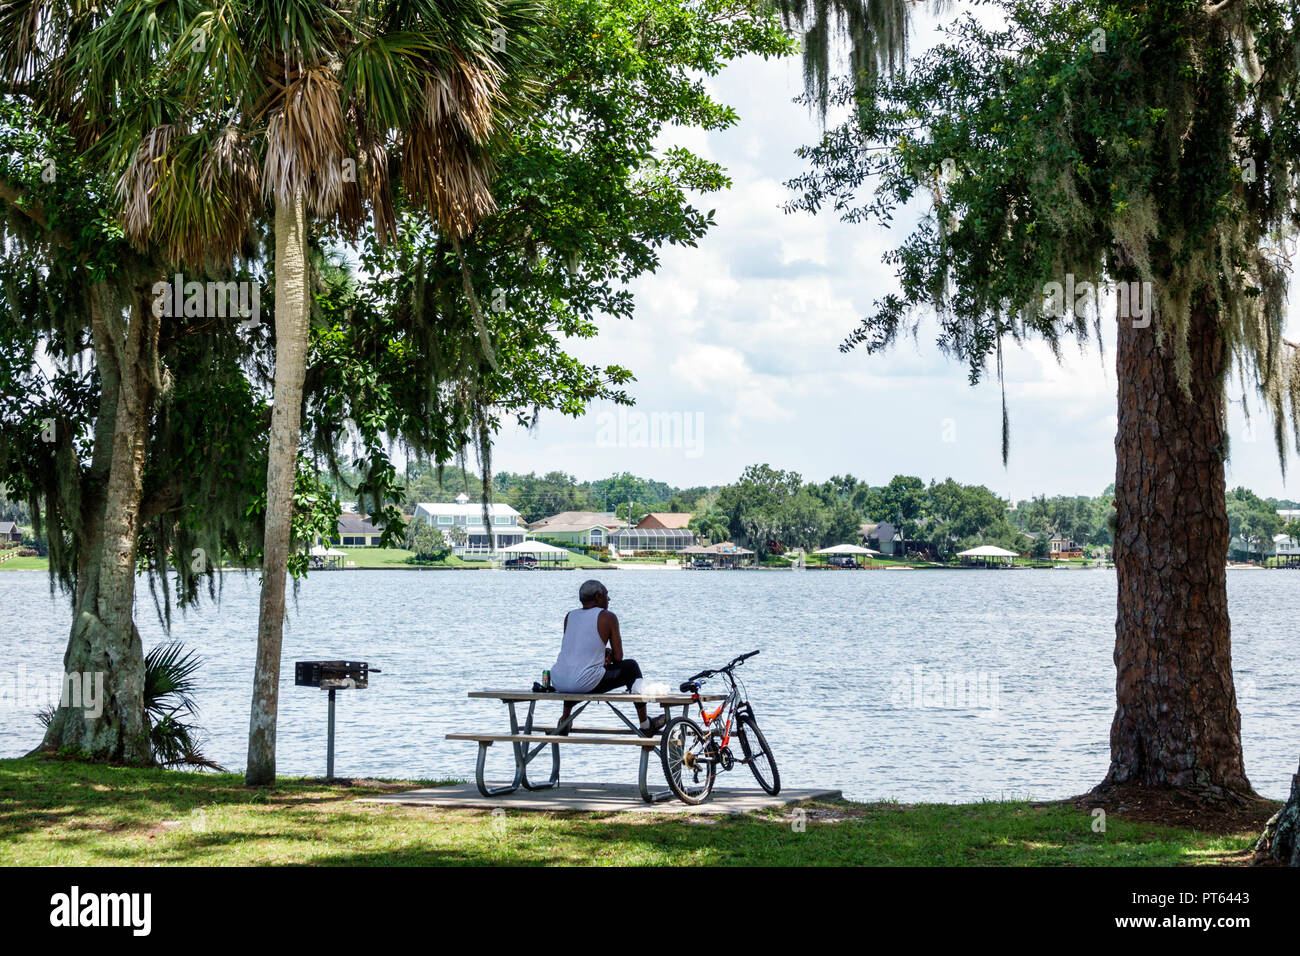 Lake Placid Florida Lake June-in-Winter H. L. Bishop Park man bicycle picnic table - Stock Image